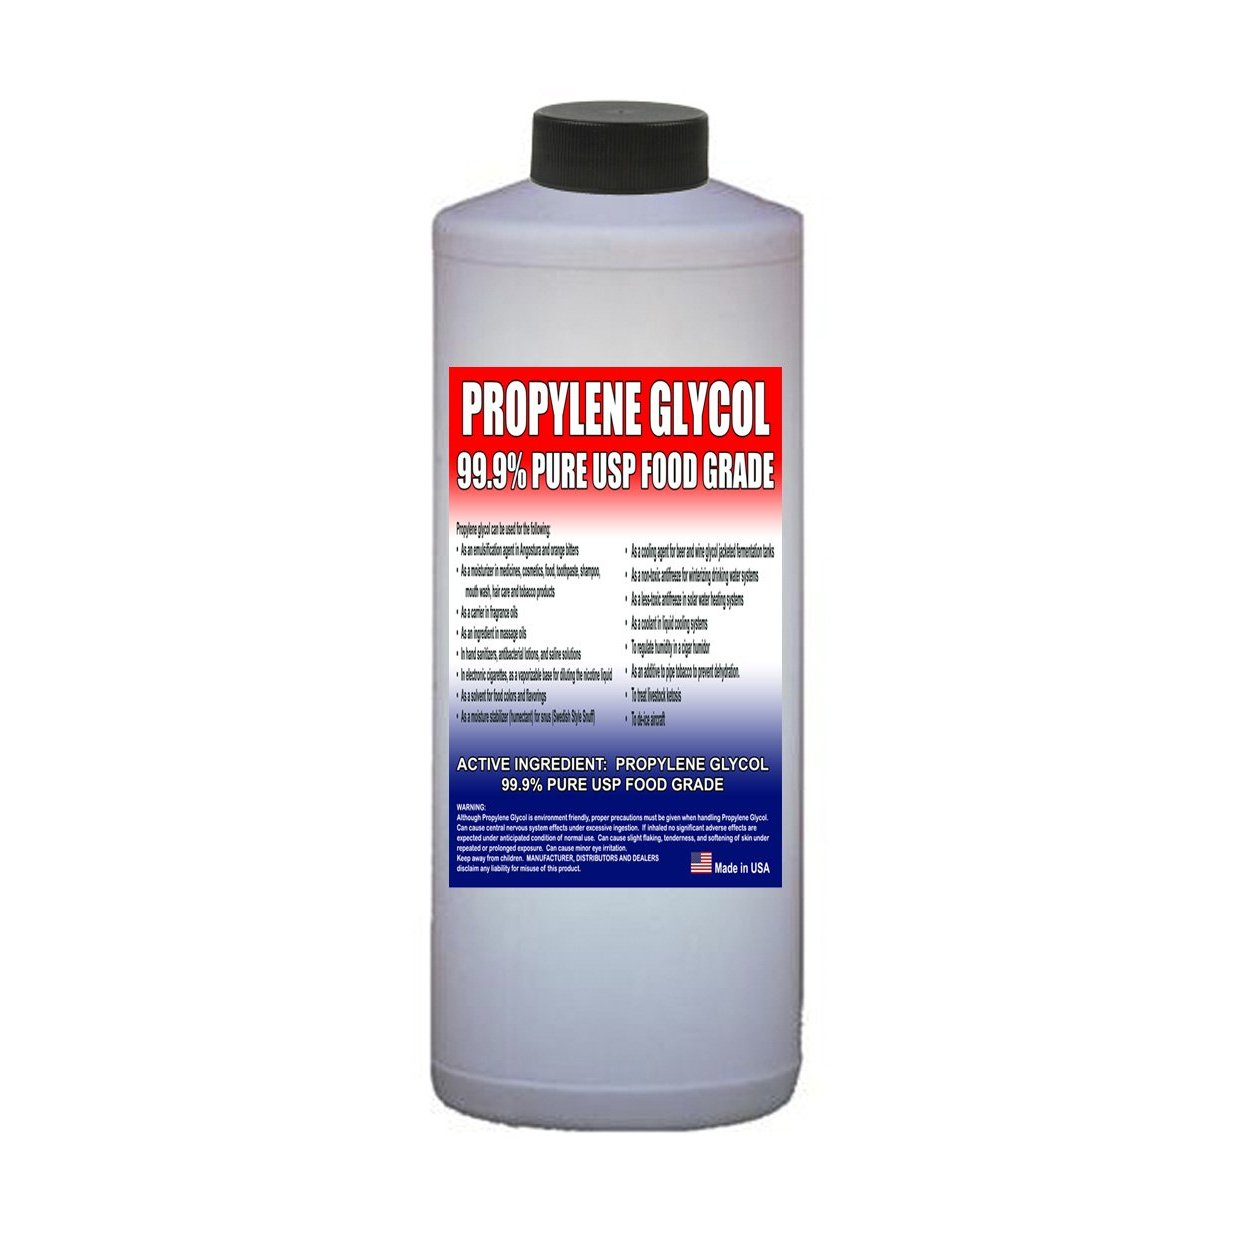 Propylene glycol - bing images.